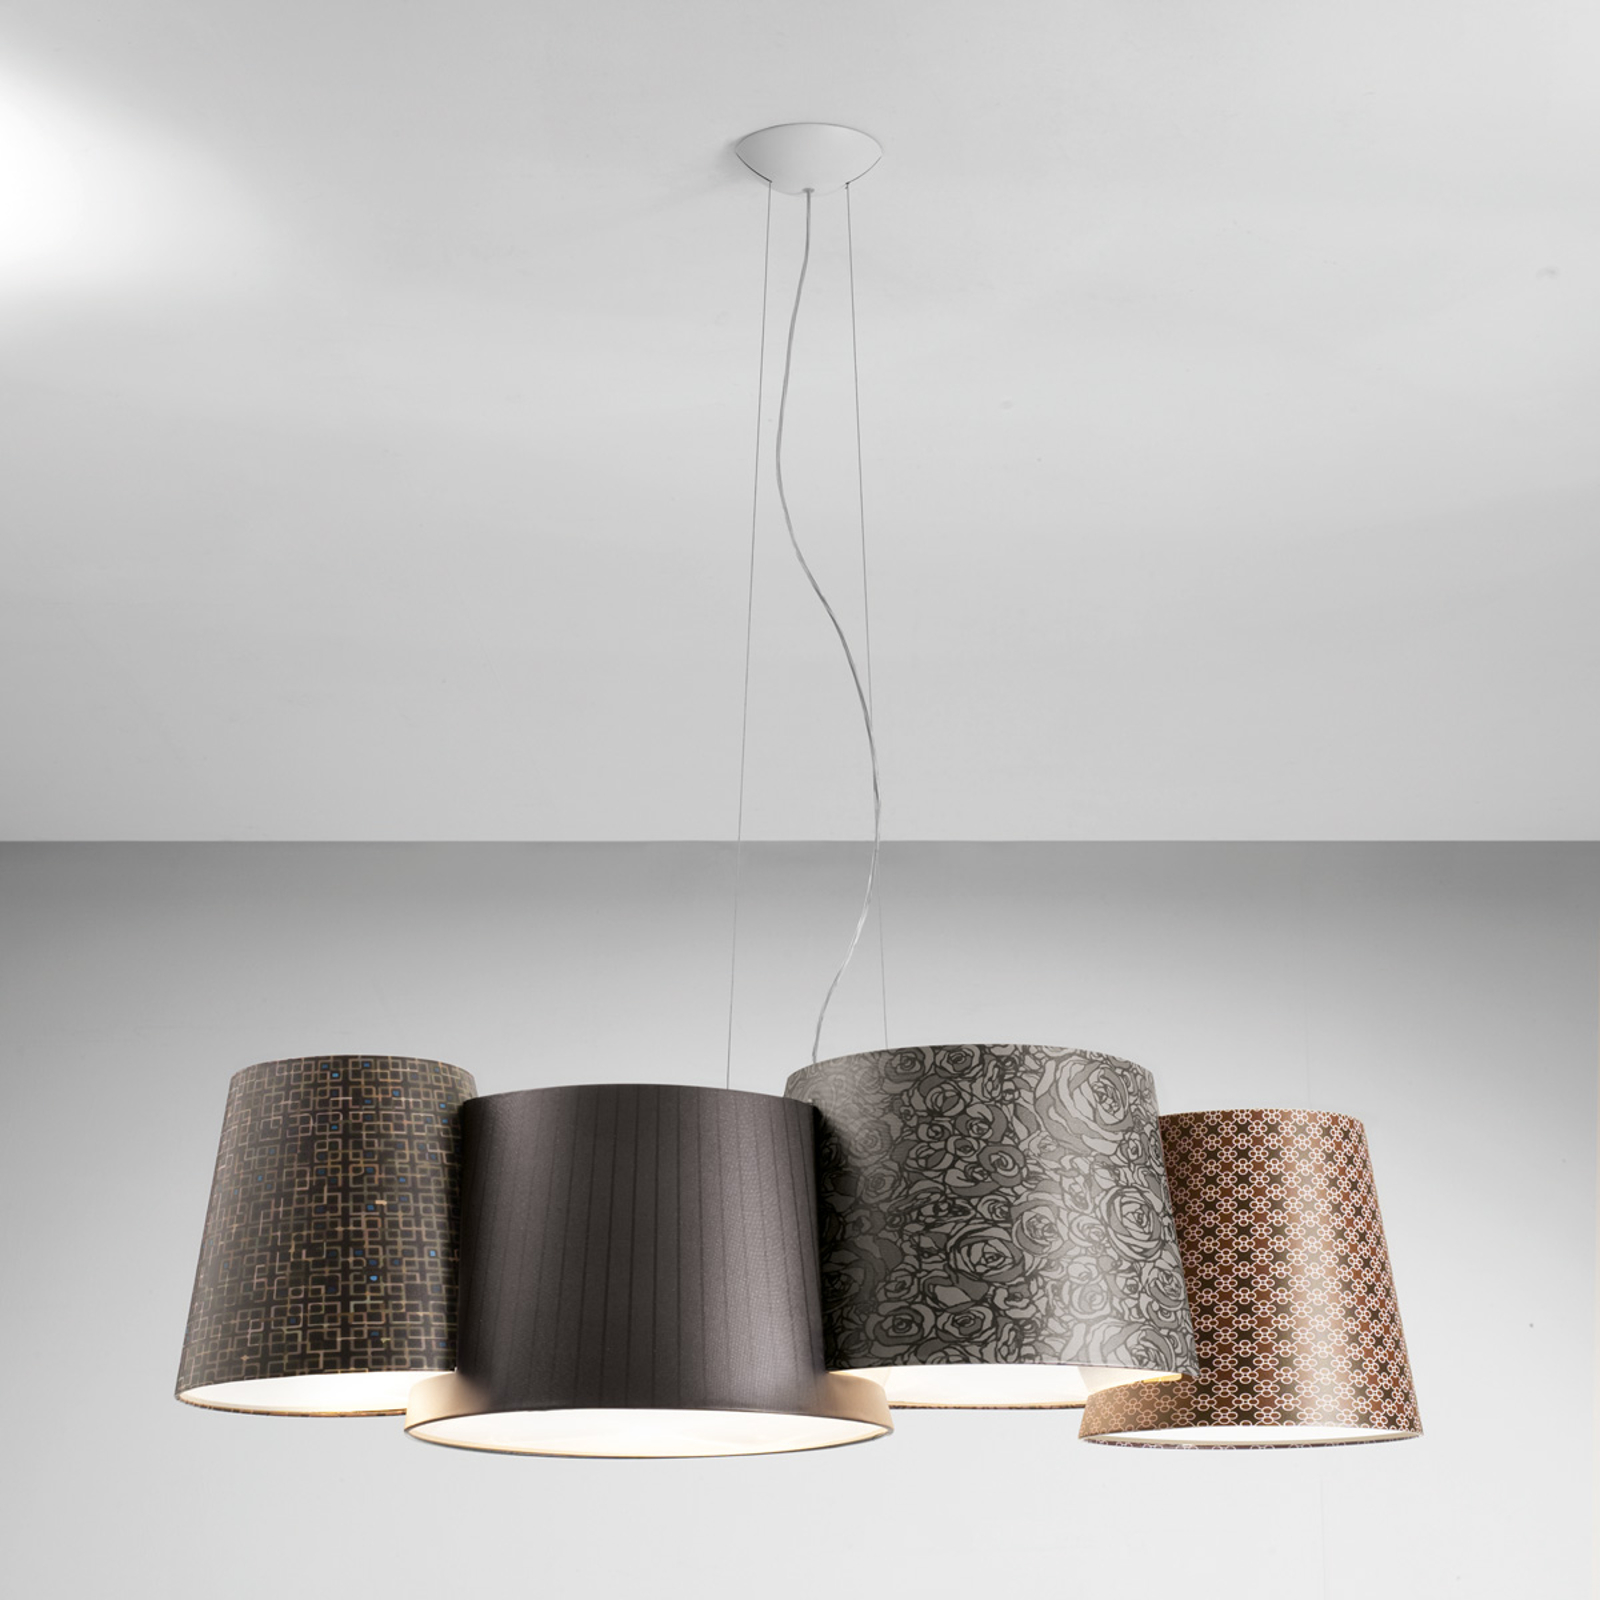 Axolight Melting Pot 115 Design-Hängelampe dunkel kaufen